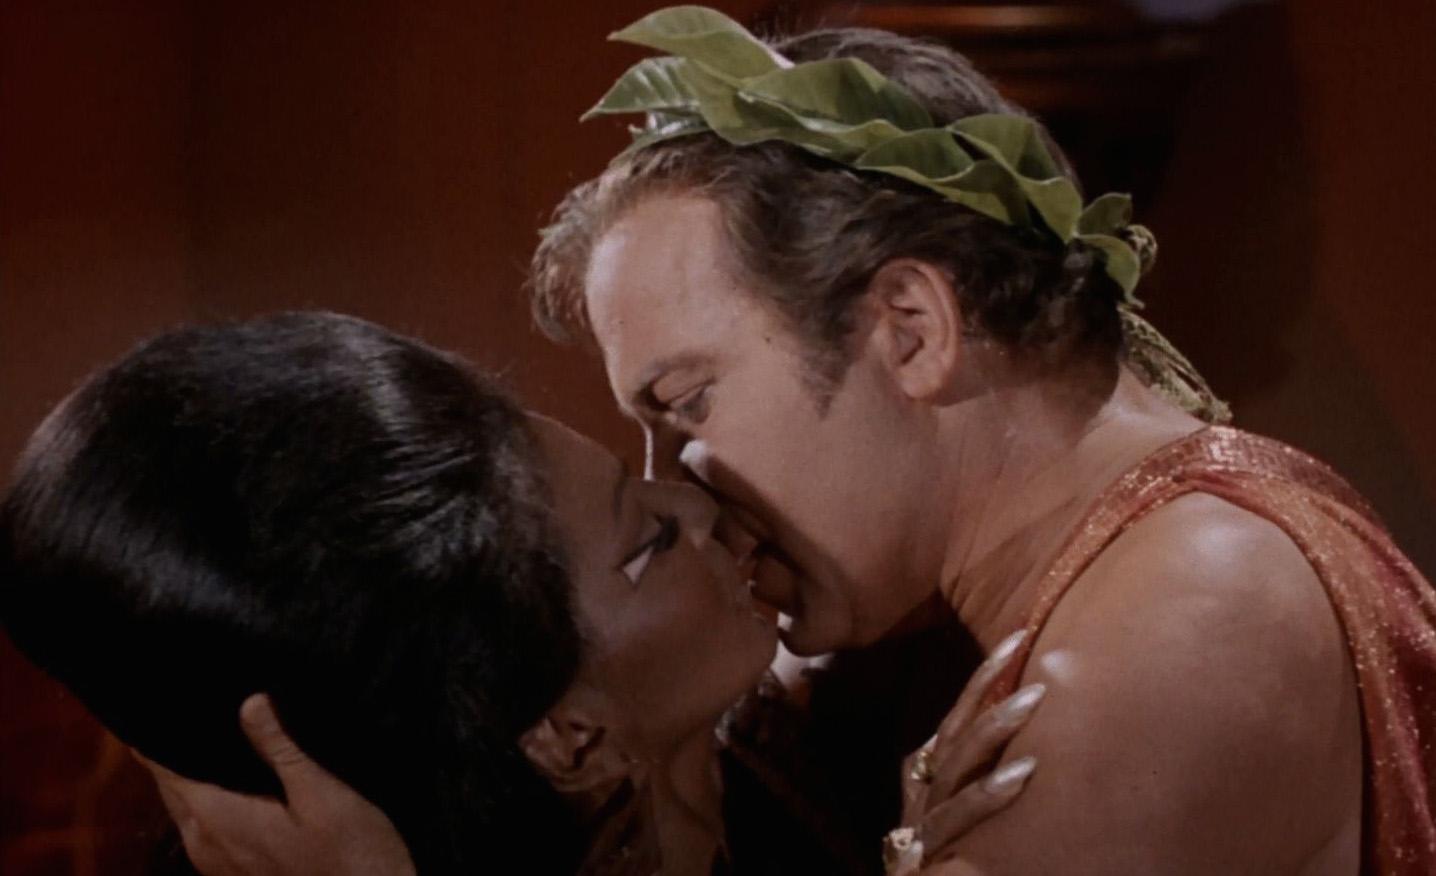 The first interracial kiss on TV on Star Trek